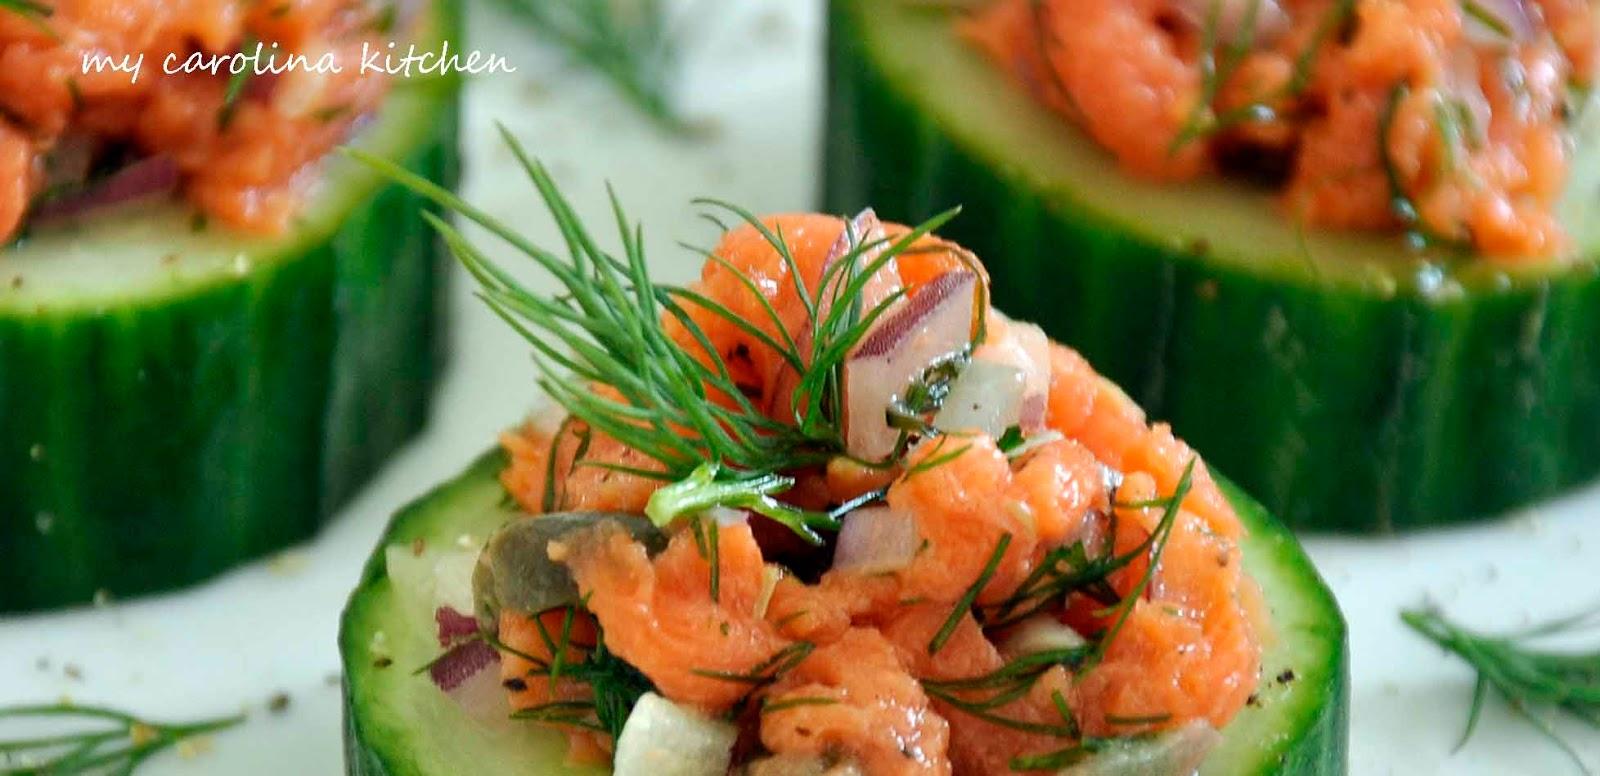 My Carolina Kitchen: Smoked Salmon on Cucumbers – featuring two ...